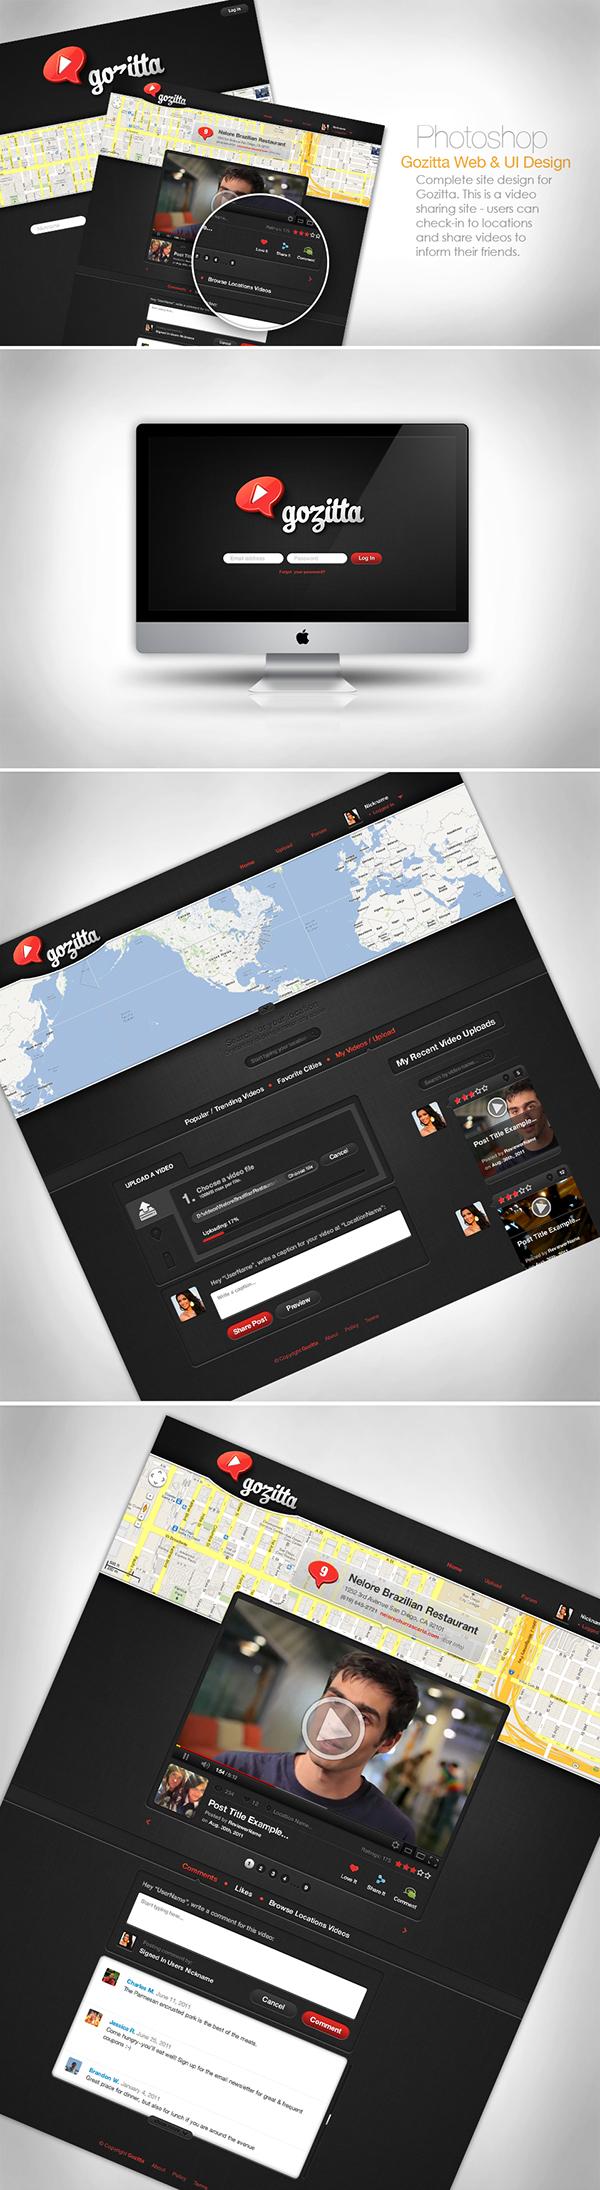 UI  user interface video visual design experience design